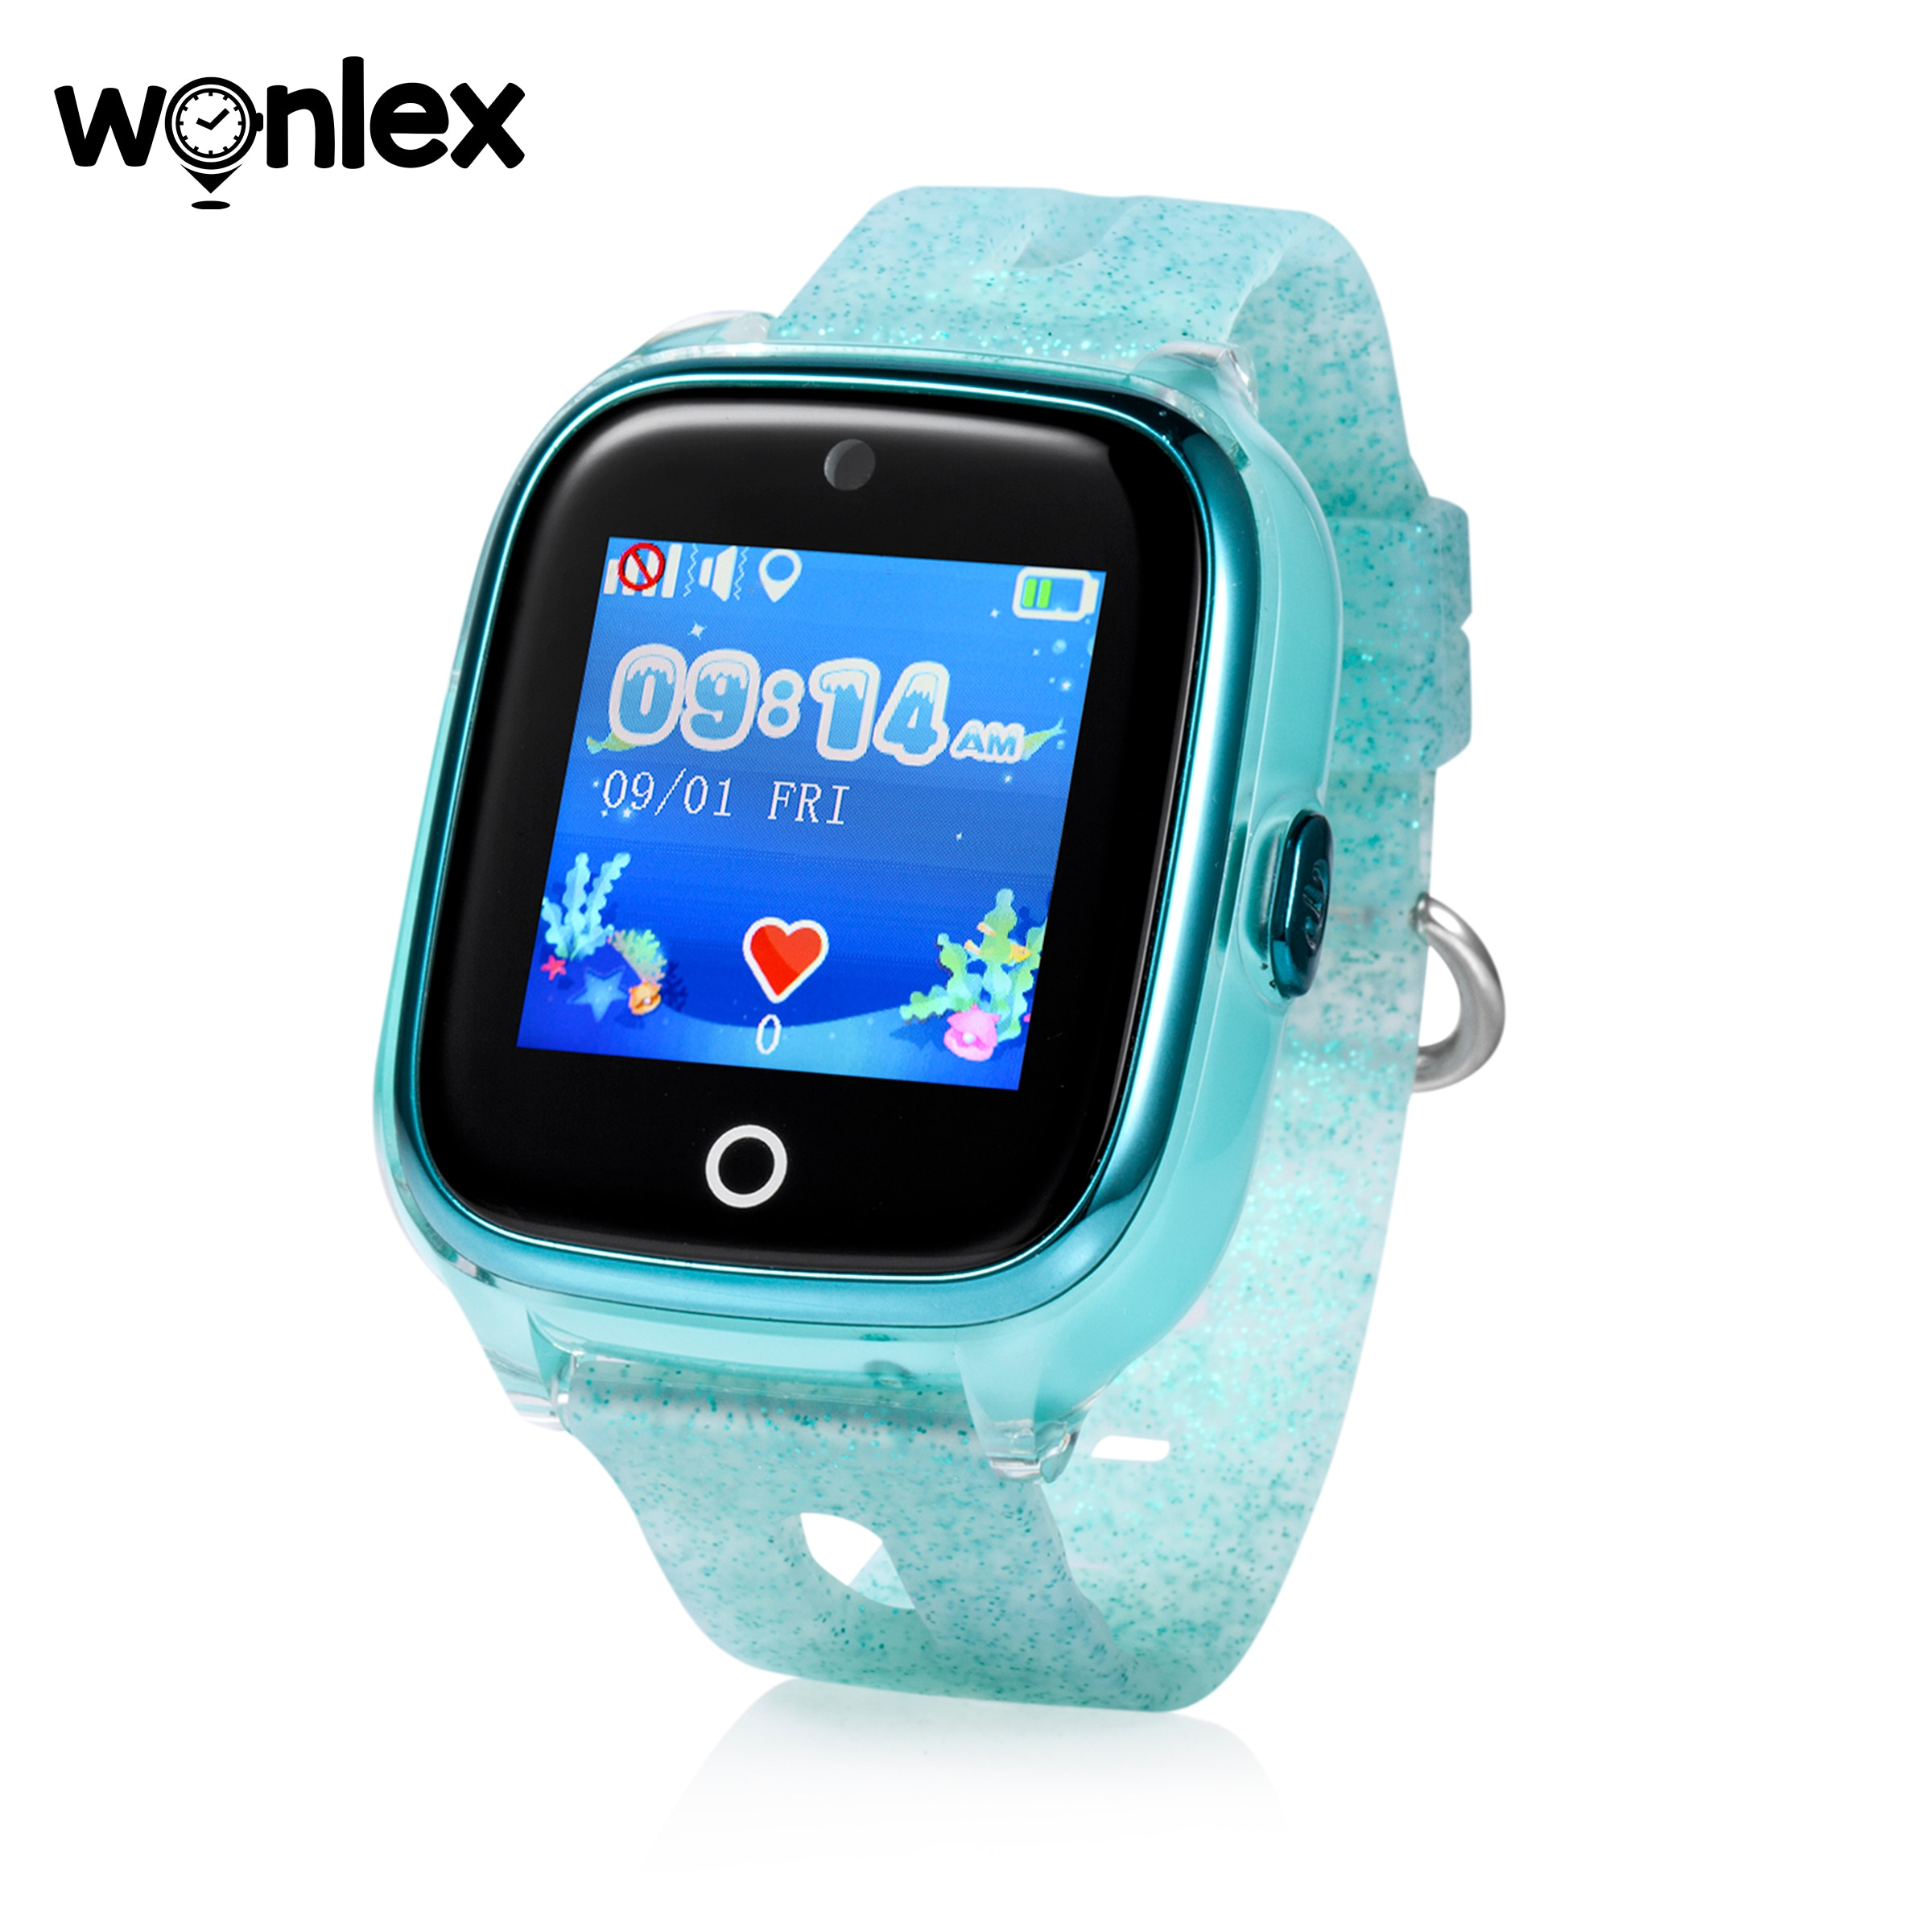 Wonlex chico s GPS WiFi reloj inteligente resistente al agua IP67 reloj inteligente chico GPS posicionamiento SOS ayuda Anti-Pérdida seTracker soporte Micro Chat